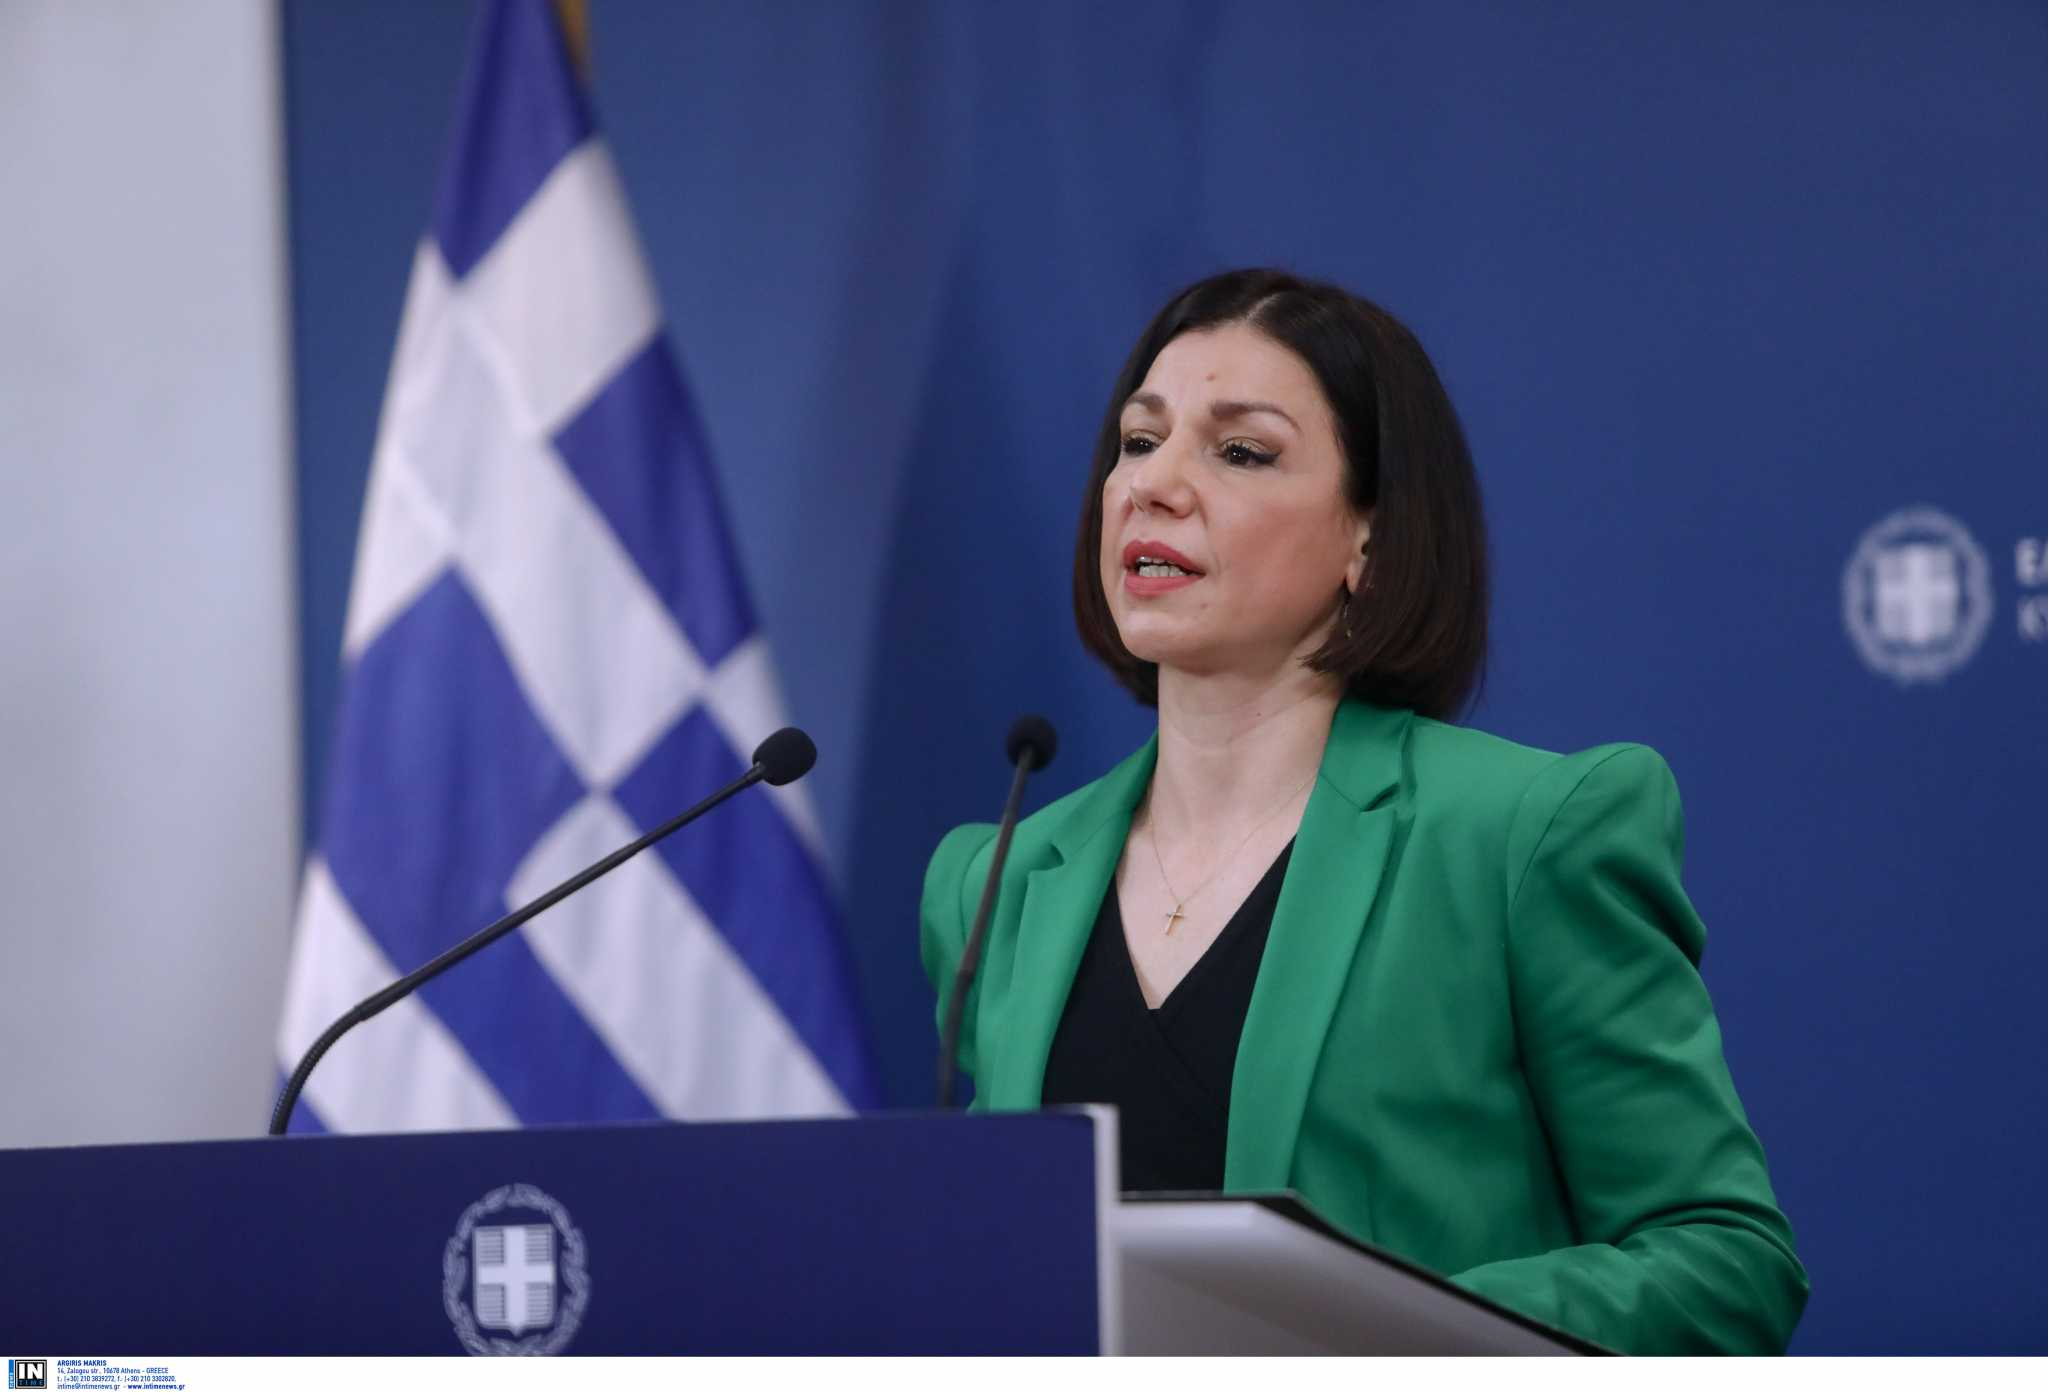 Live: Η ενημέρωση από την κυβερνητική εκπρόσωπο, Αριστοτελία Πελώνη